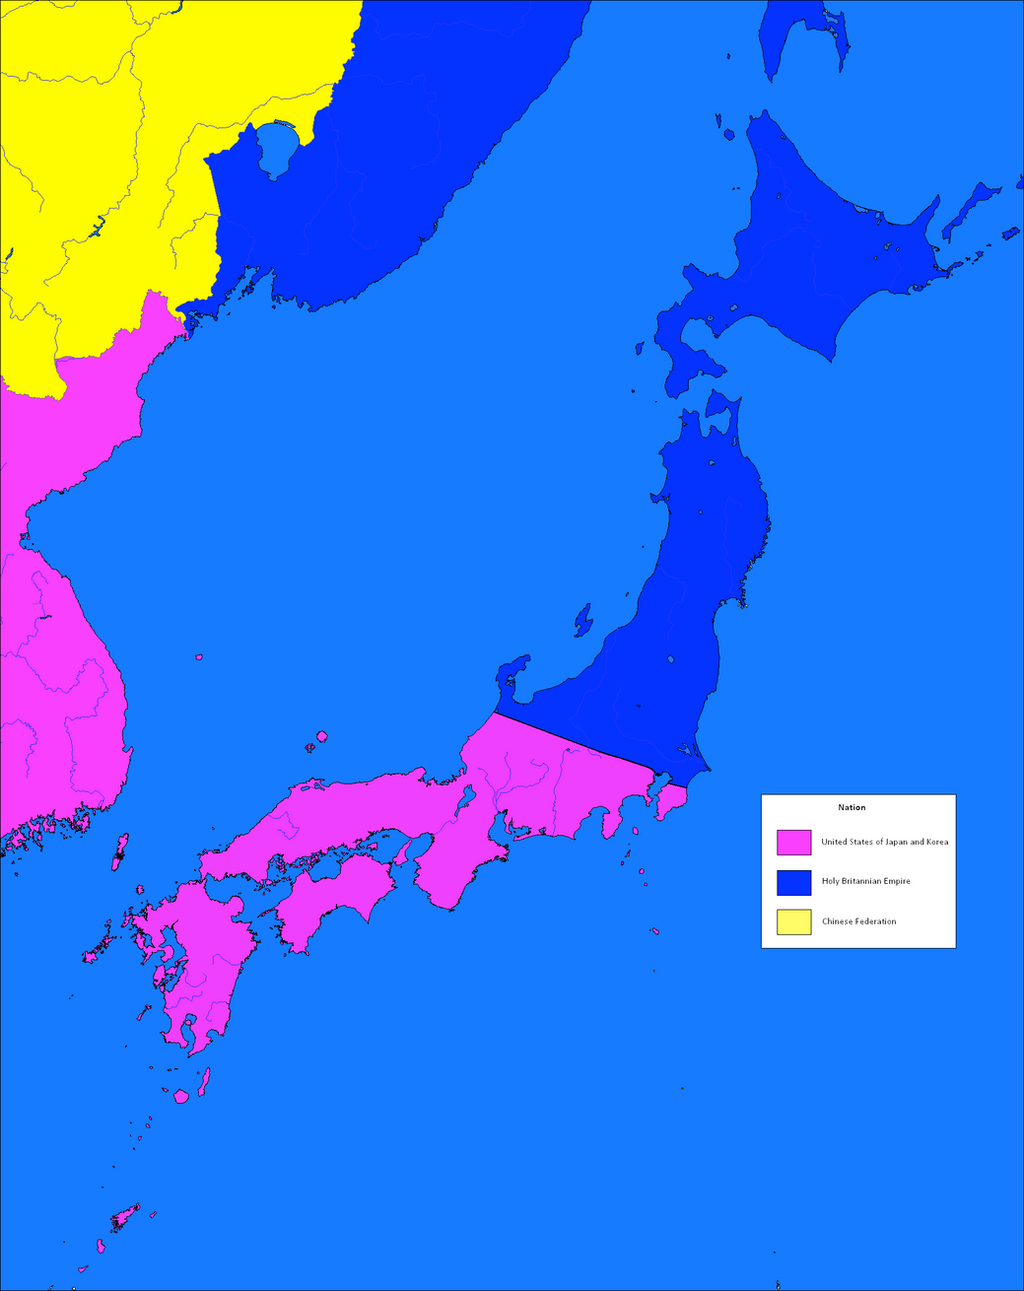 Code Geass Warfare Japan Map By Animeheckyeah On DeviantArt - World map us and japan